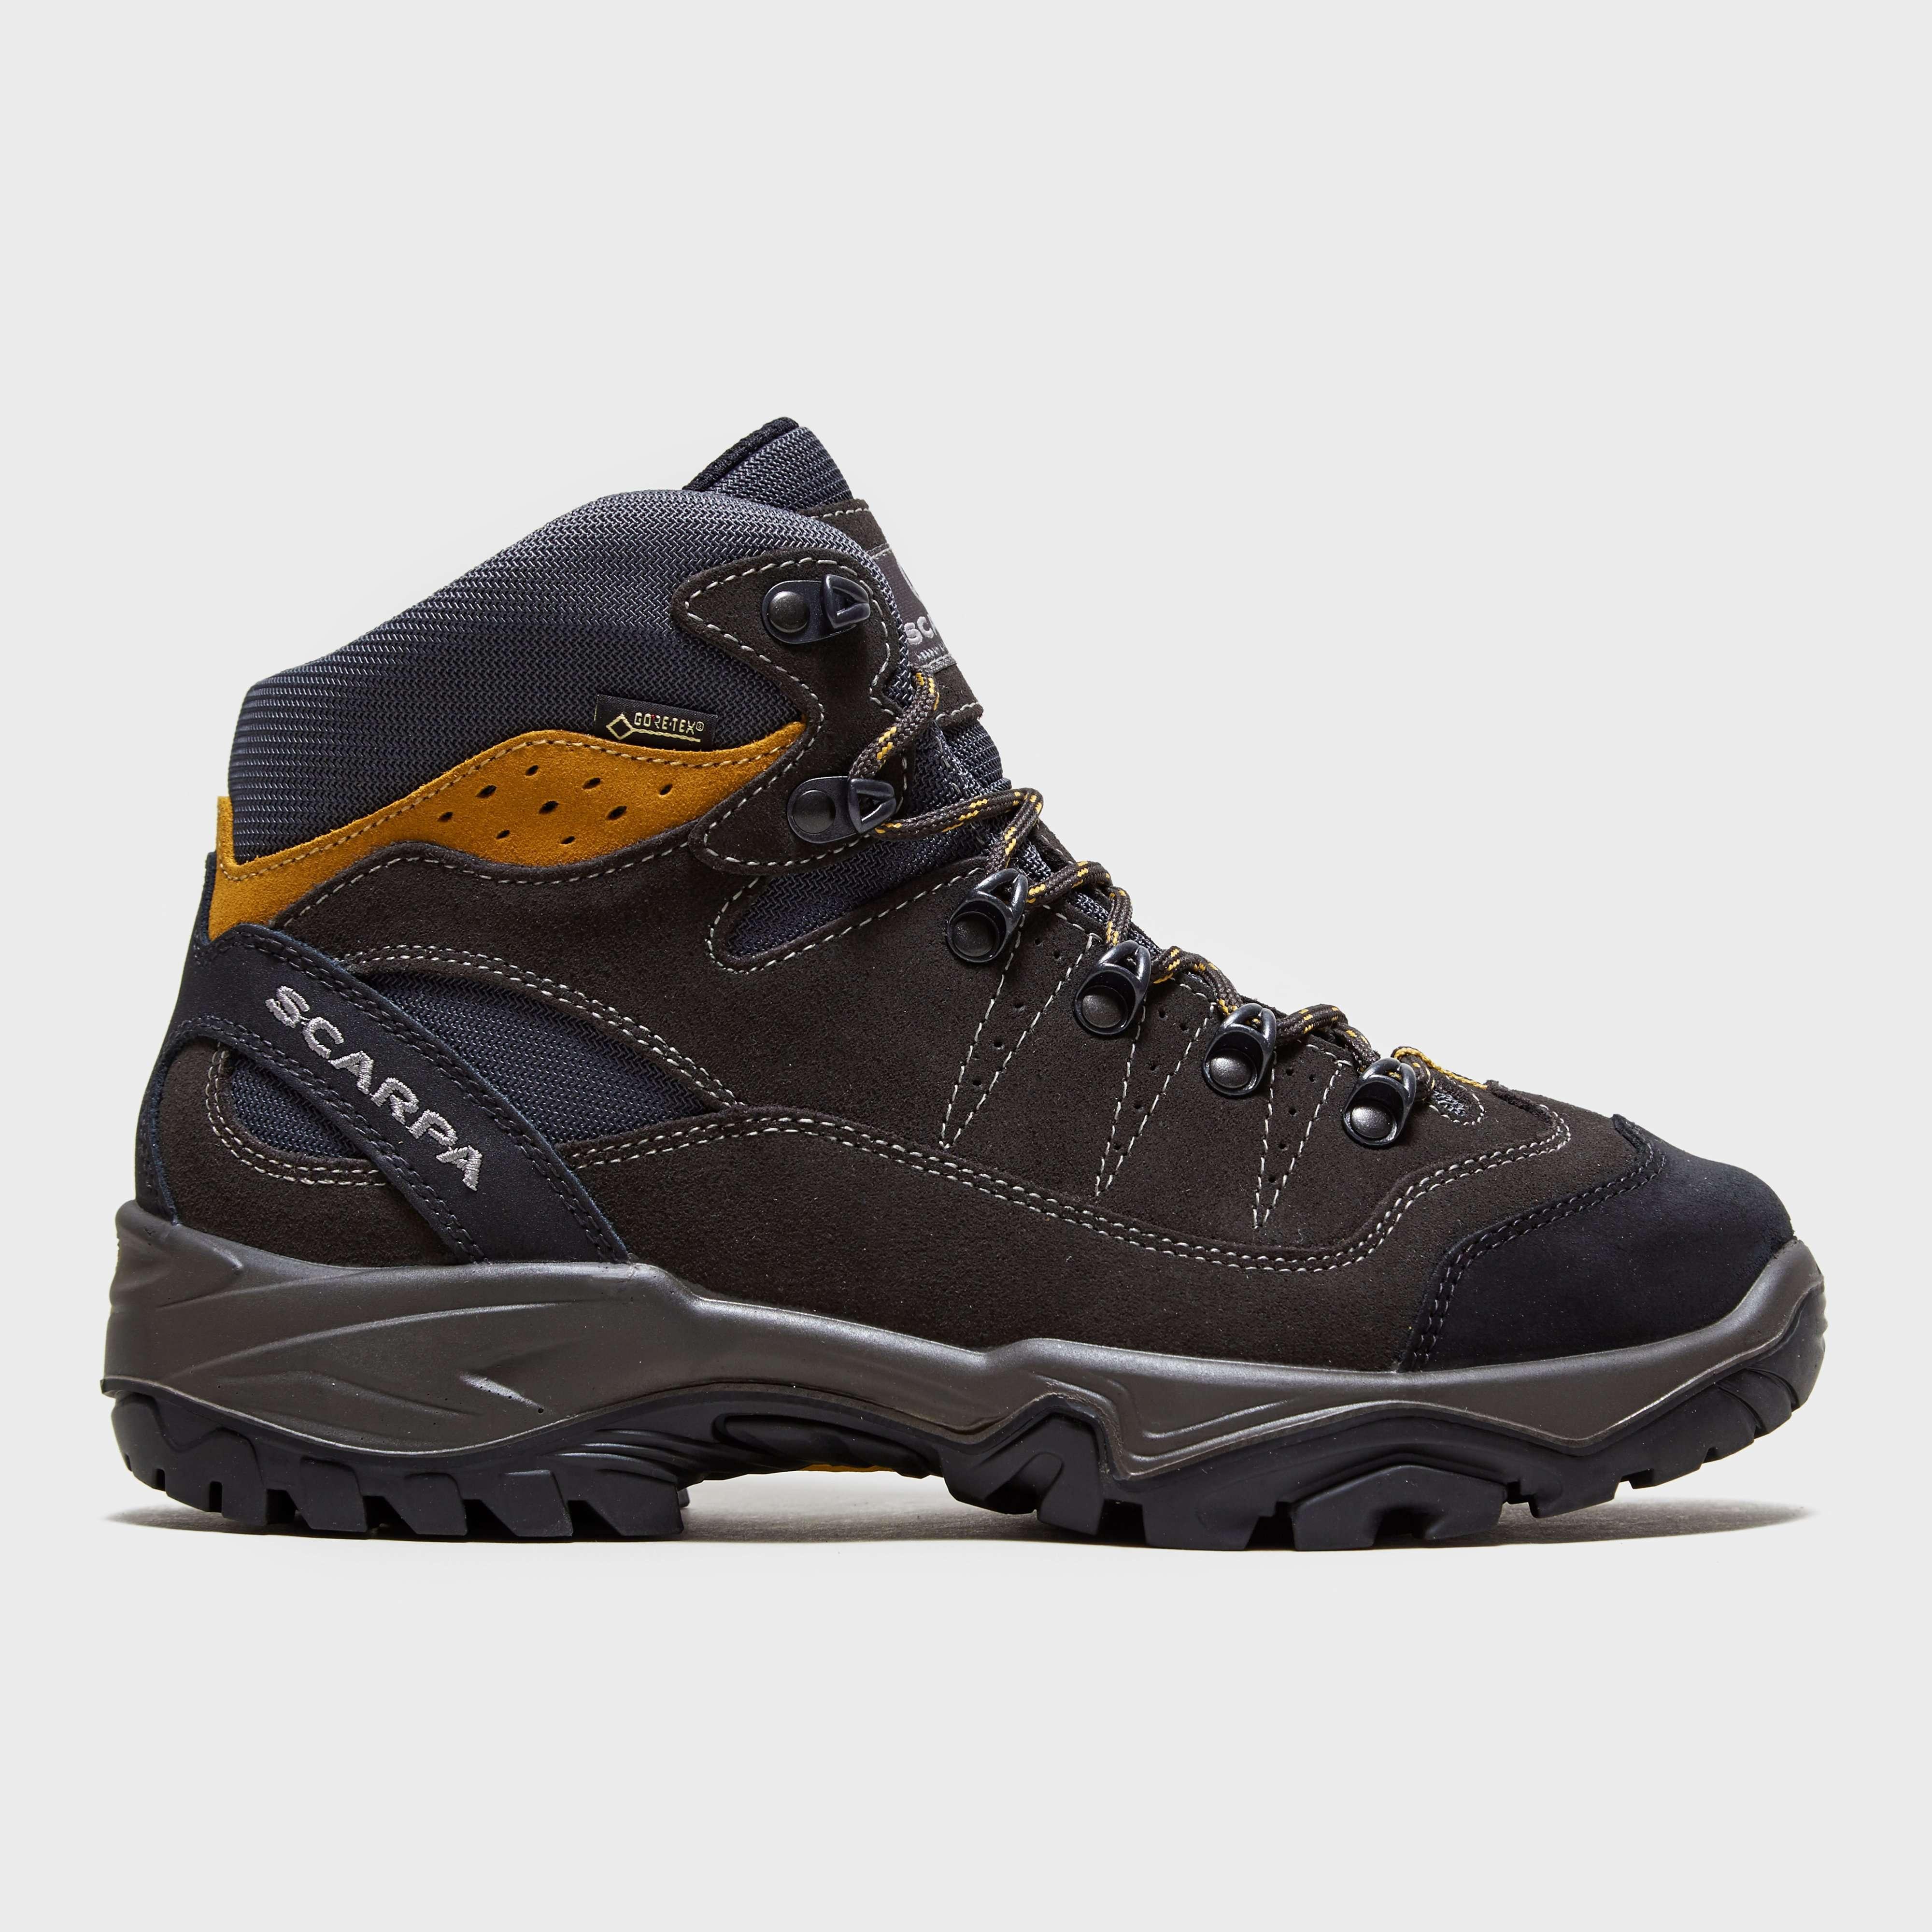 SCARPA Men's Mistral GORE-TEX® Boots